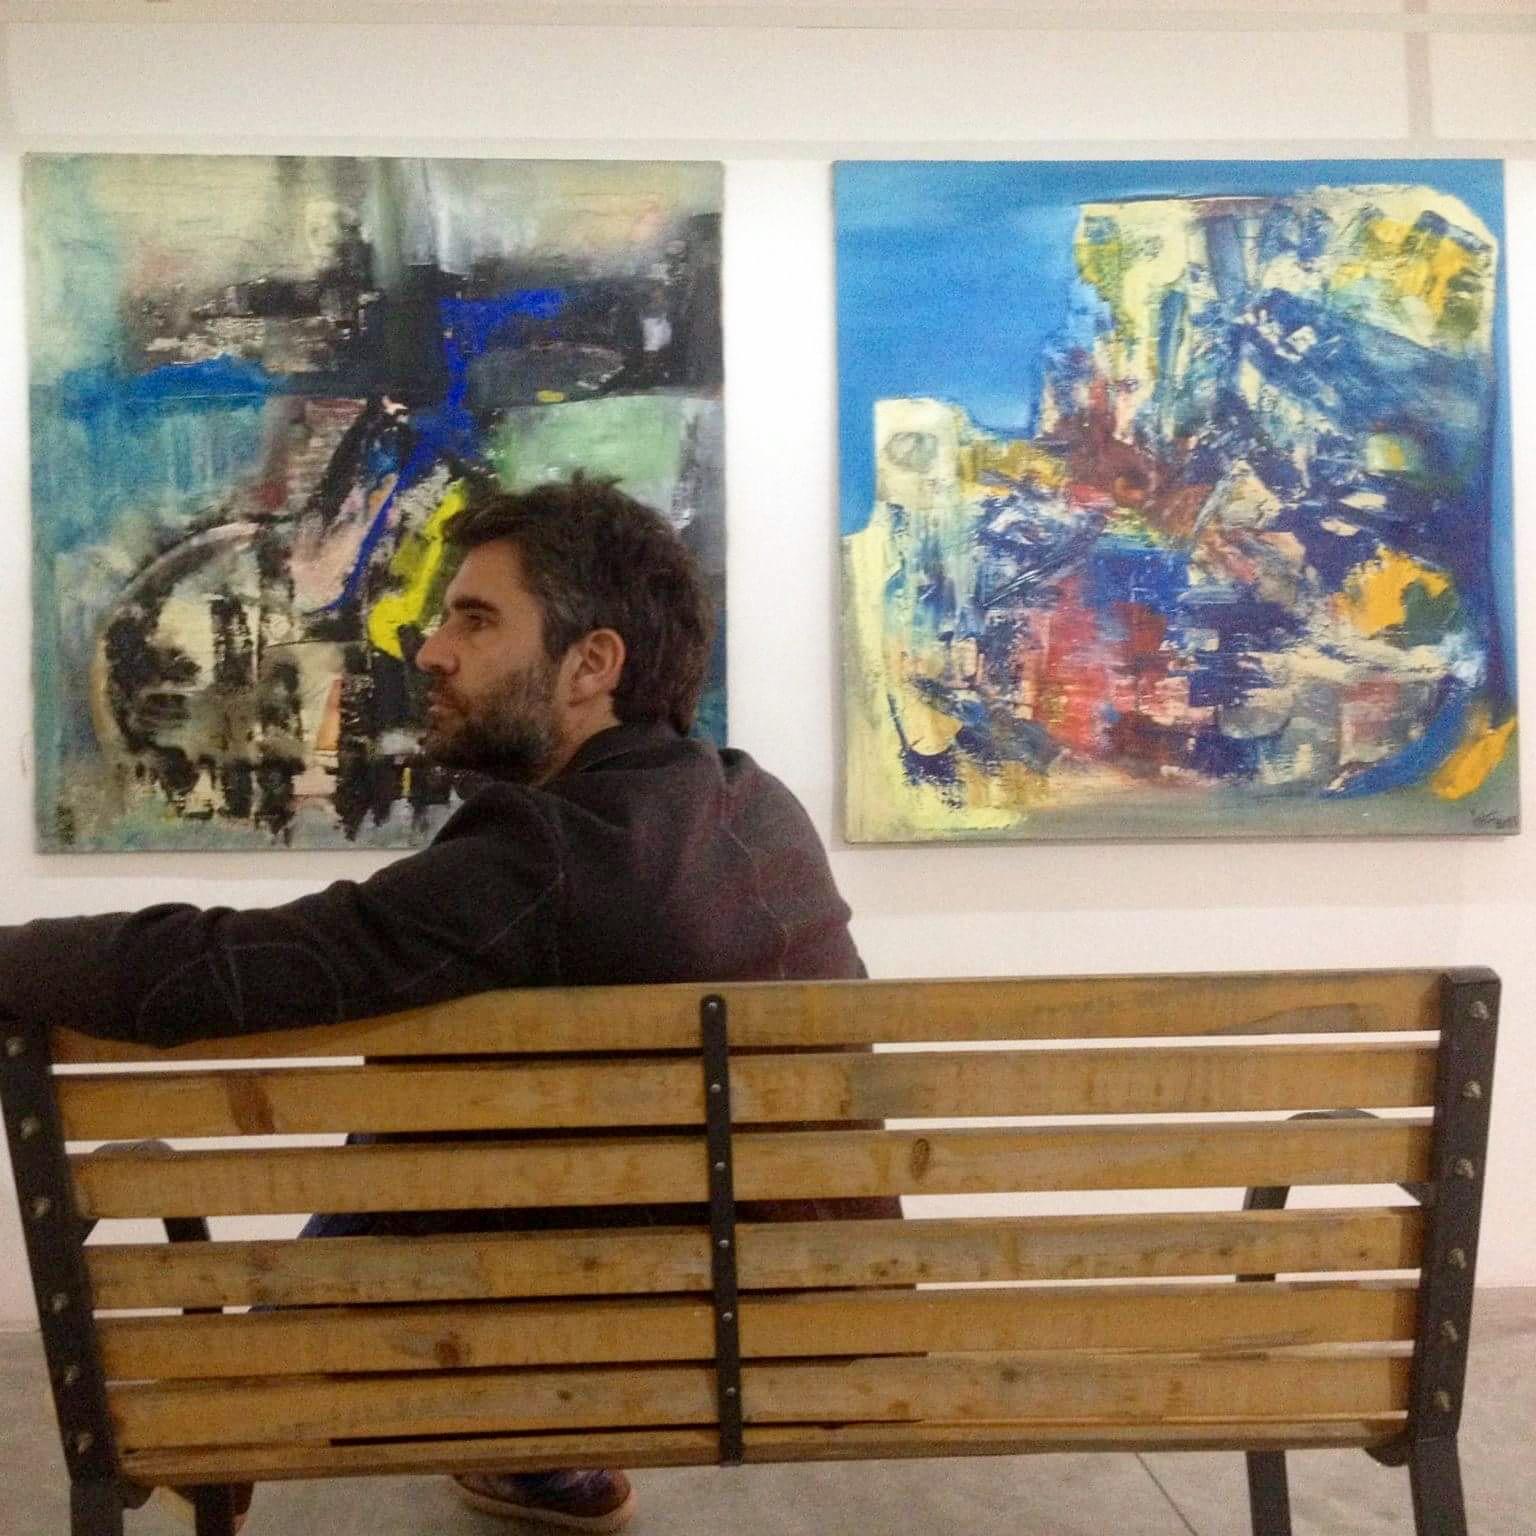 Art critic David Miliozzi